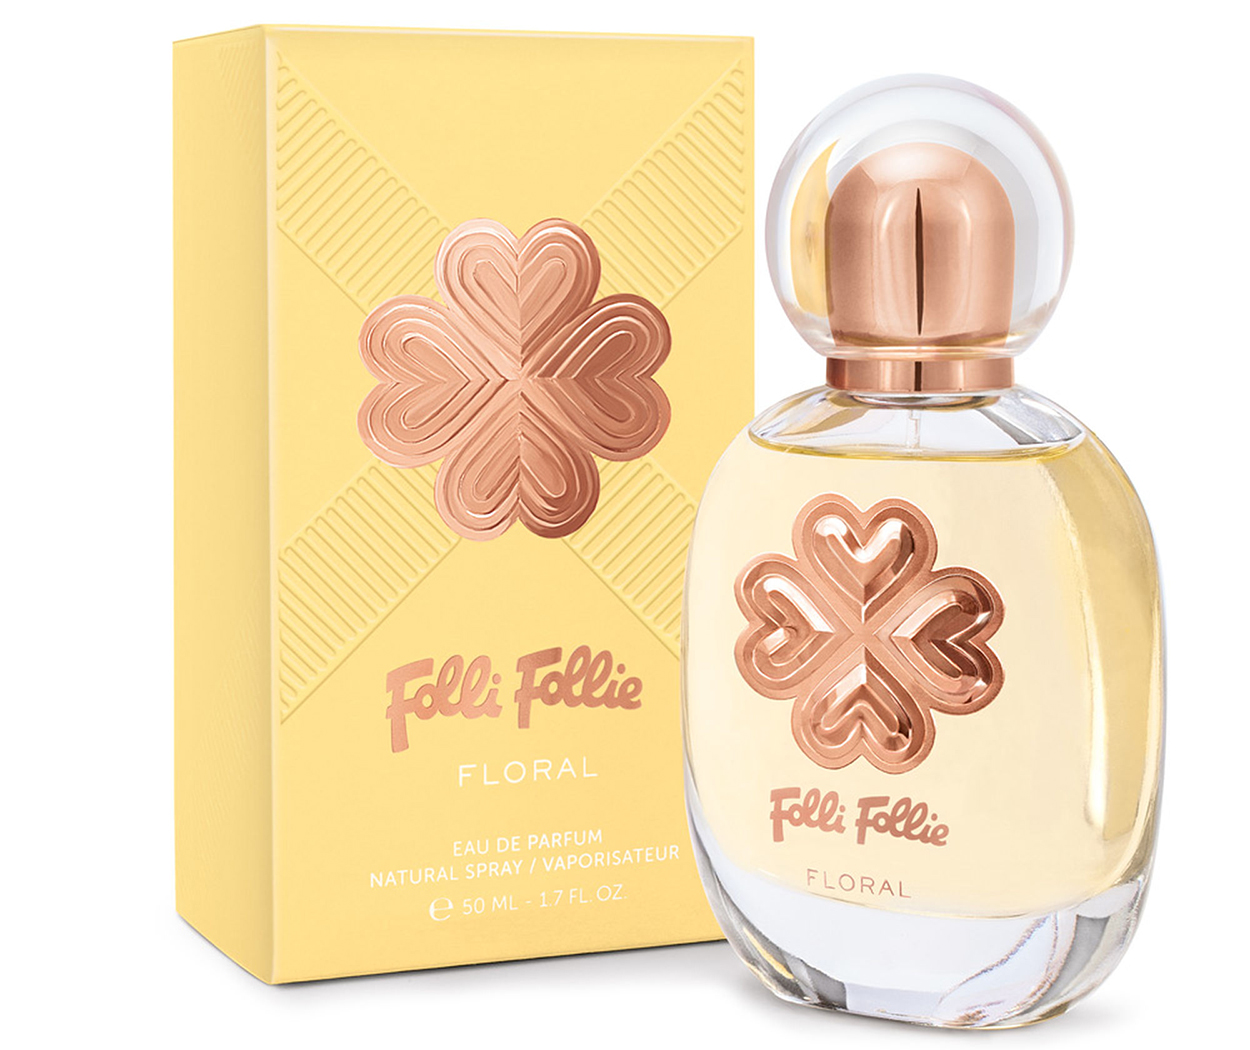 Folli-Follie-Floral.jpg